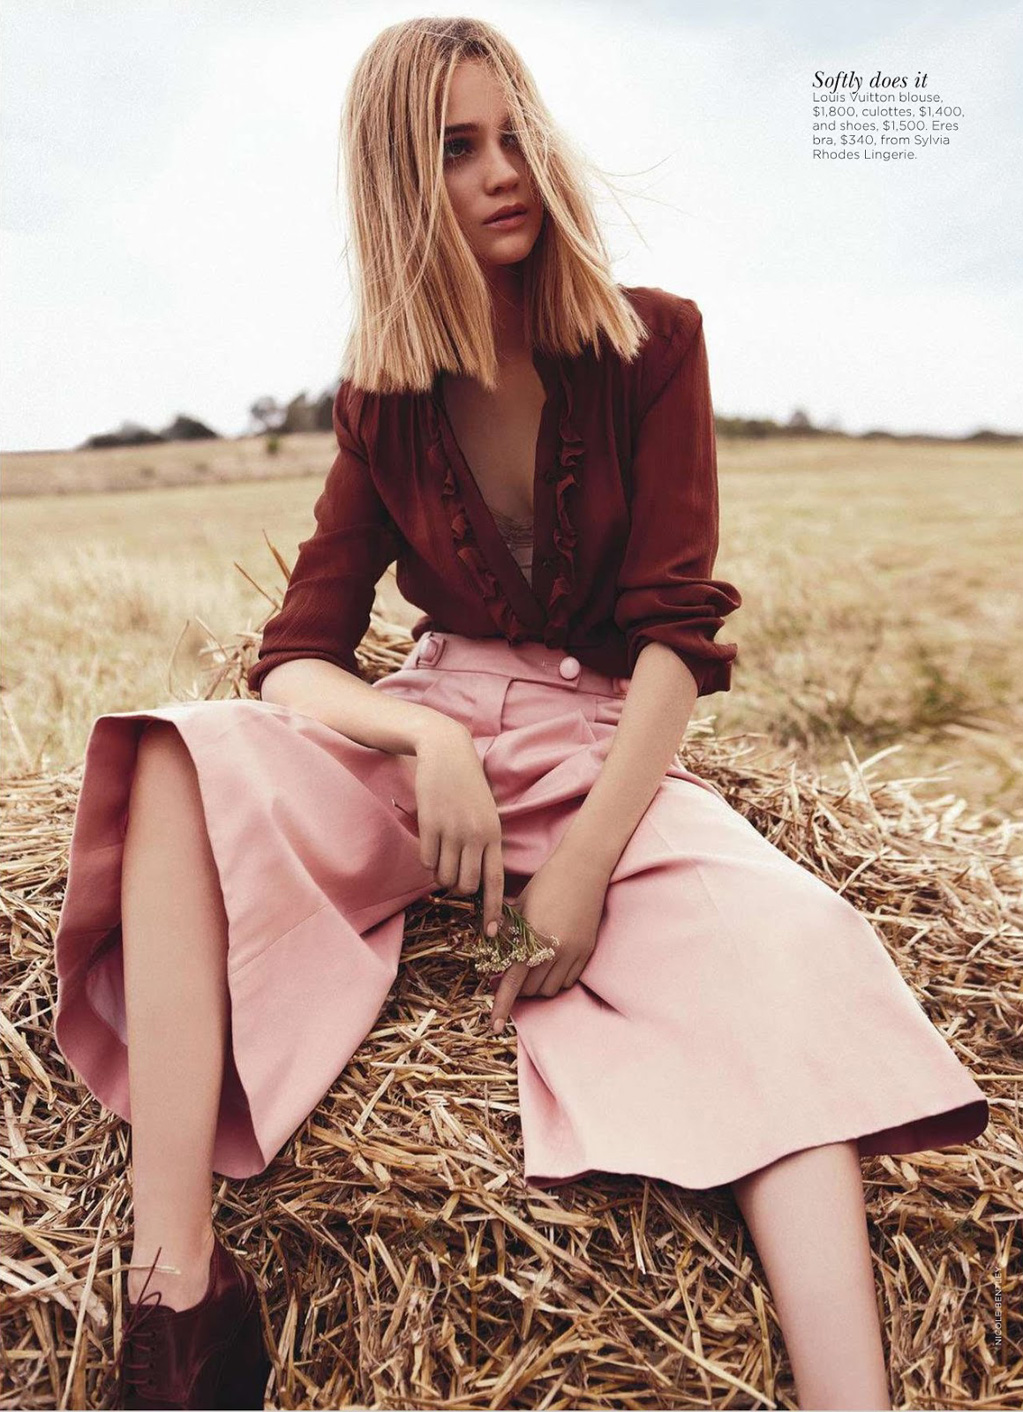 Field of Dreams Rosie Tupper by Nicole Bentley for Vogue Australia 7